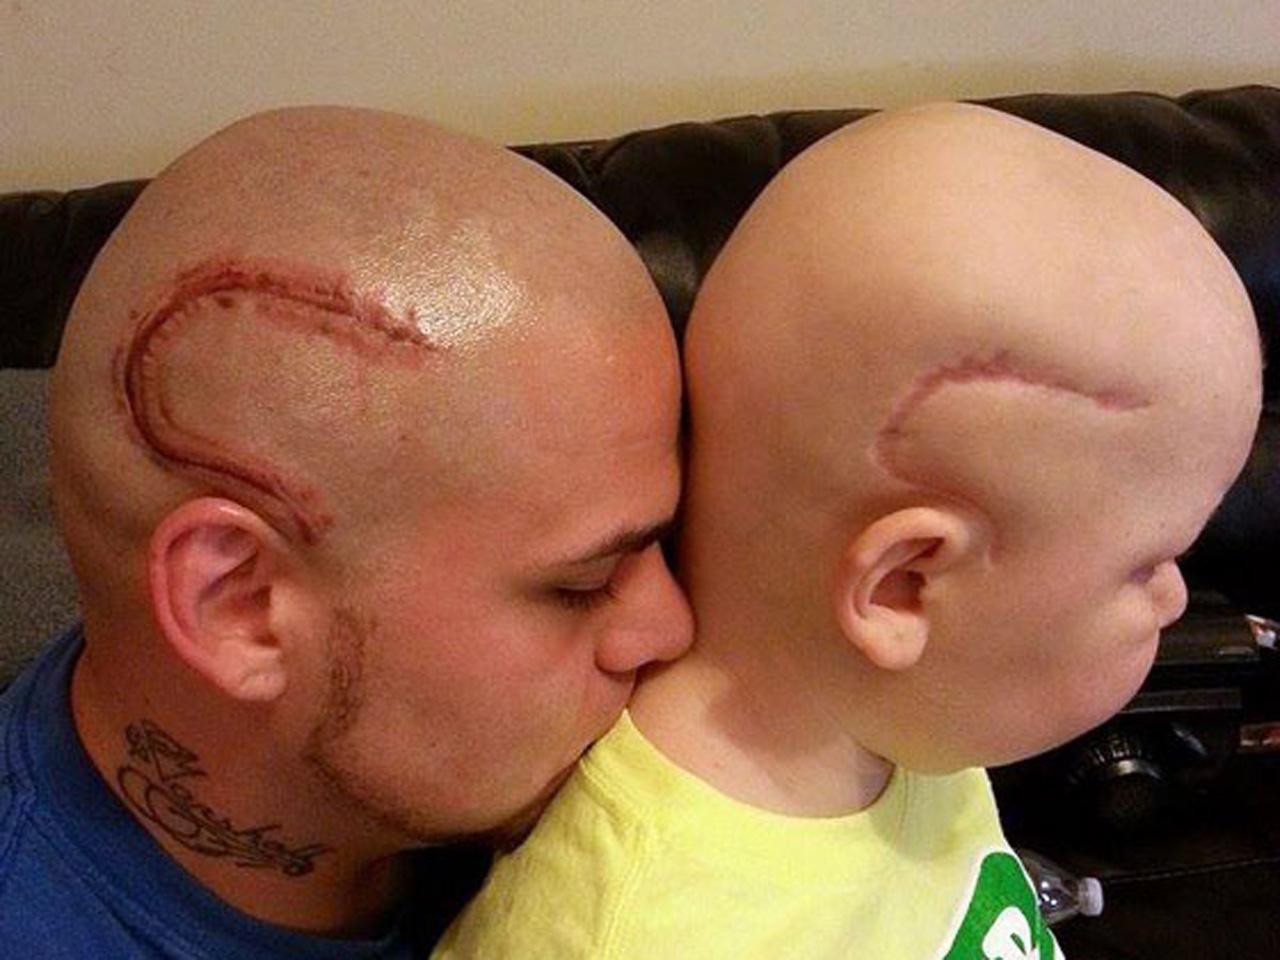 80d36900a Kansas dad gets head tattoo to match son's cancer scar - CBS News